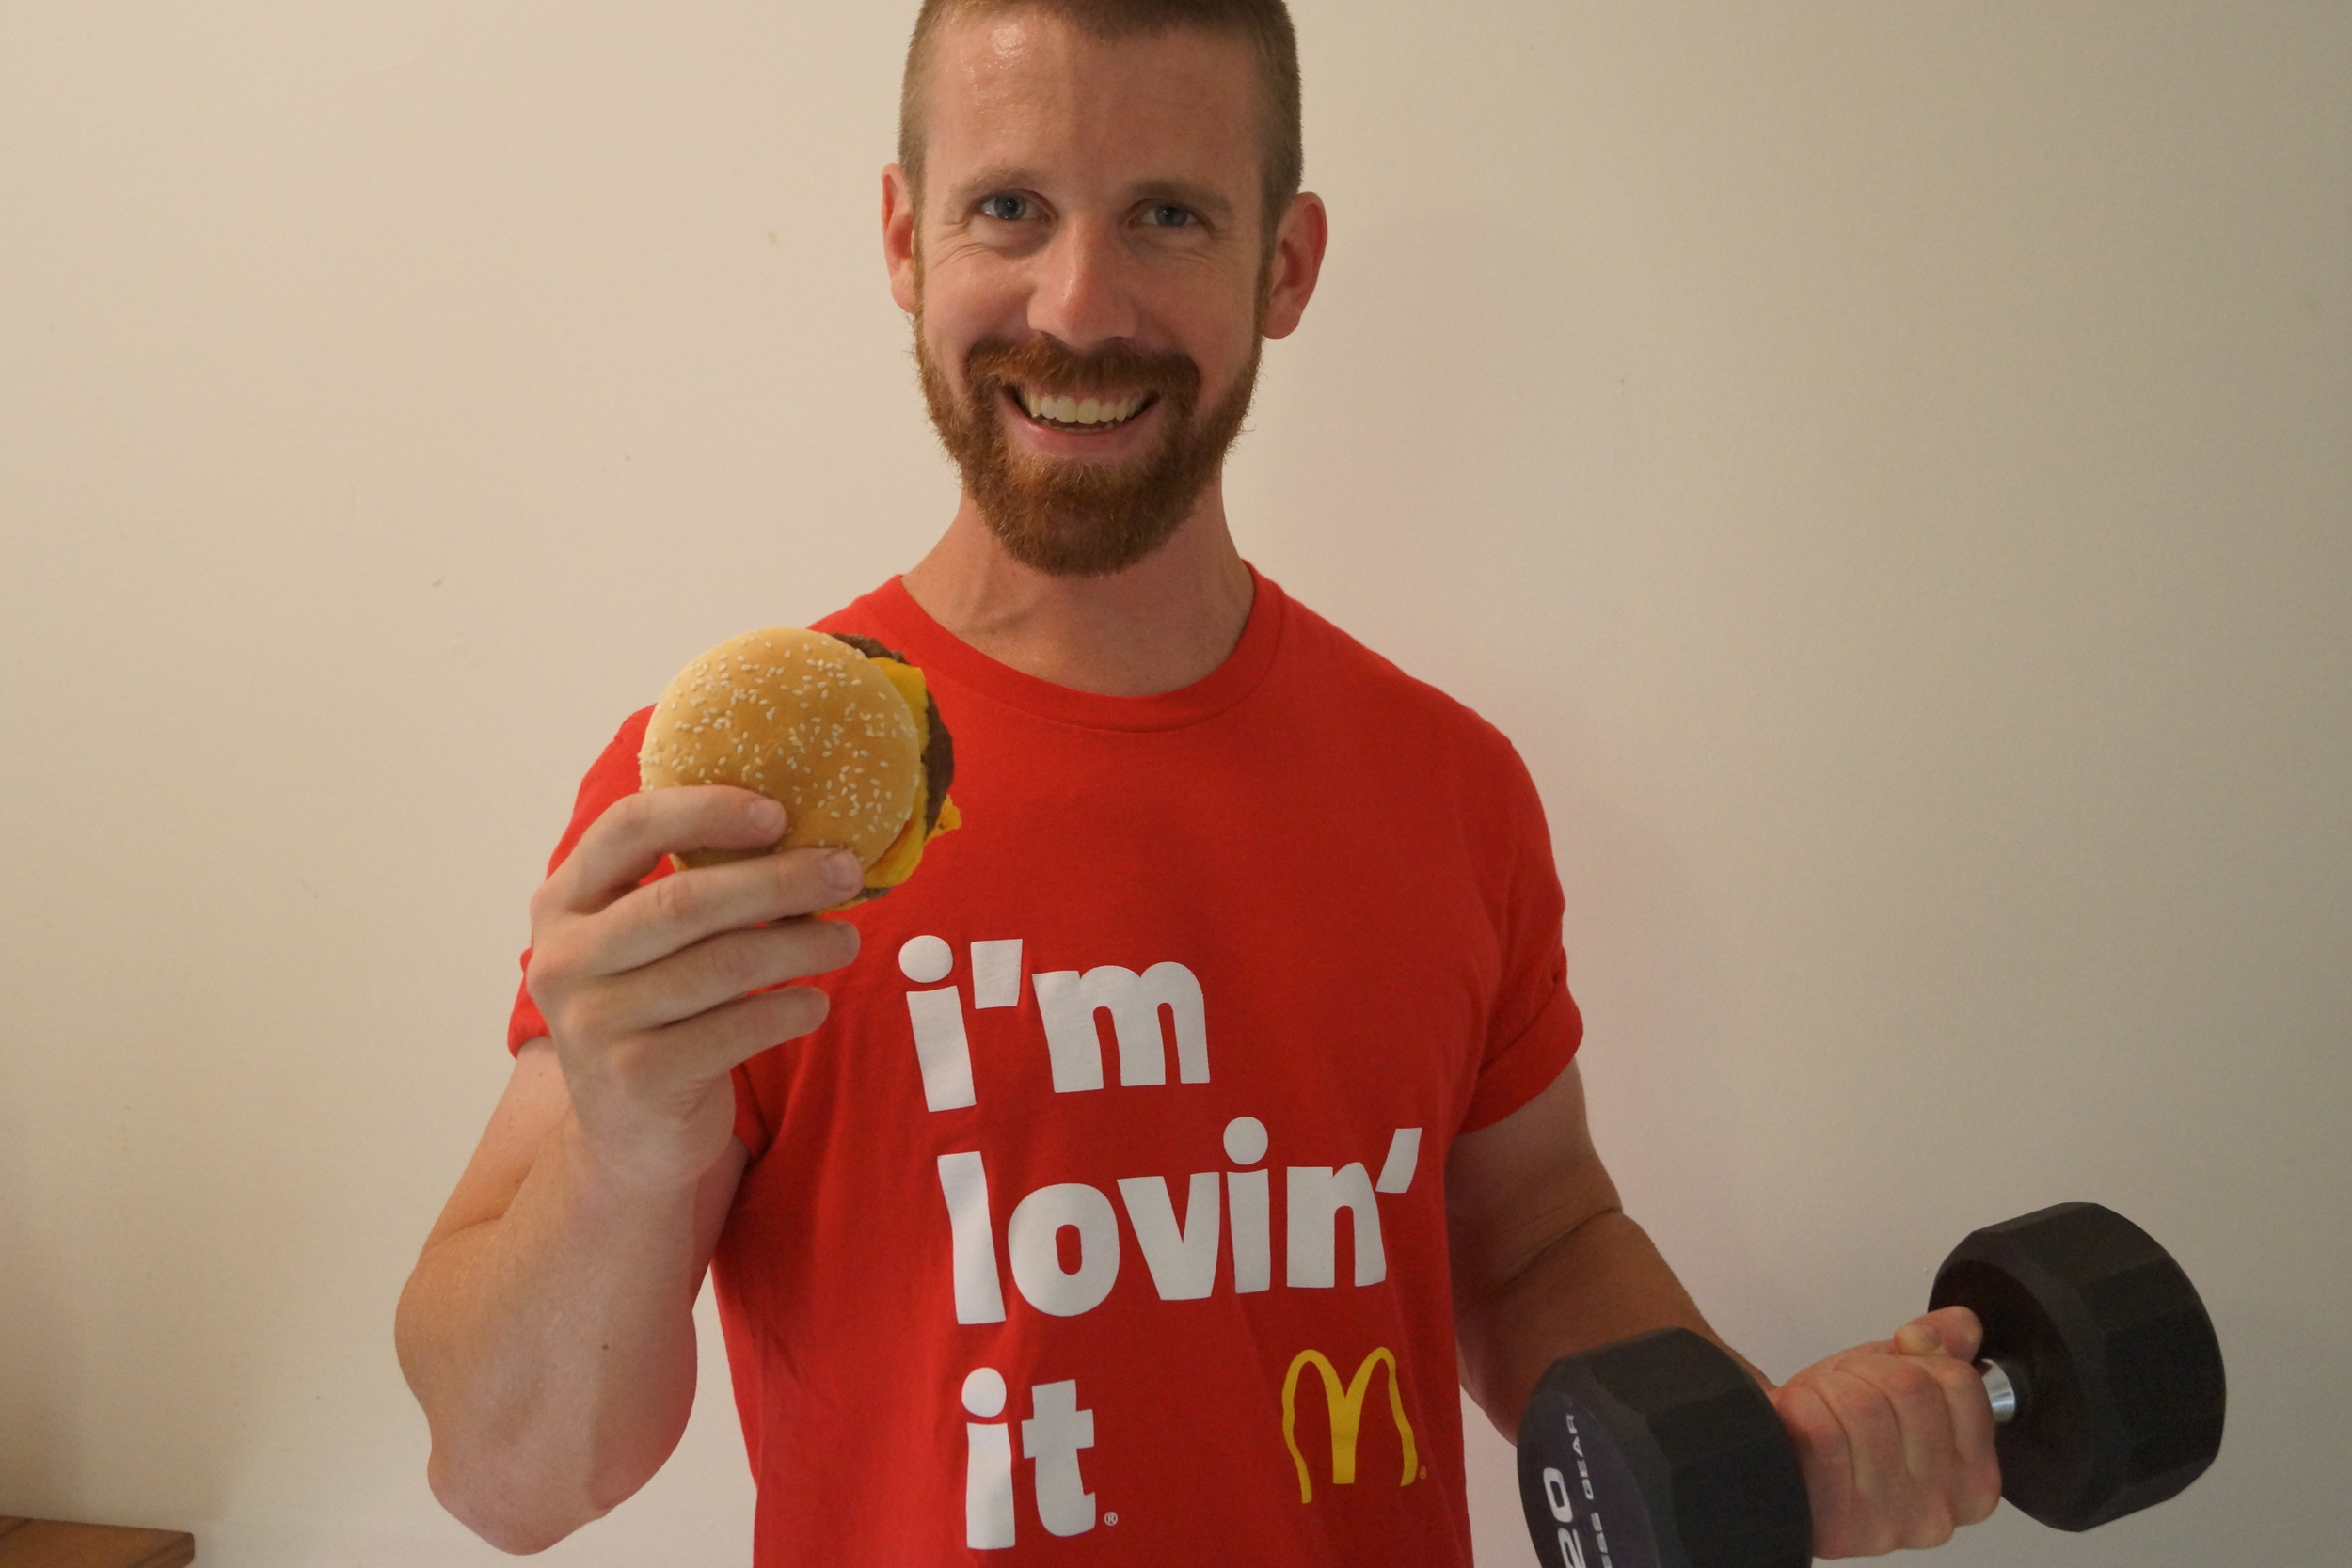 McDonalds Cheeseburger I'm Loving It and Exercise